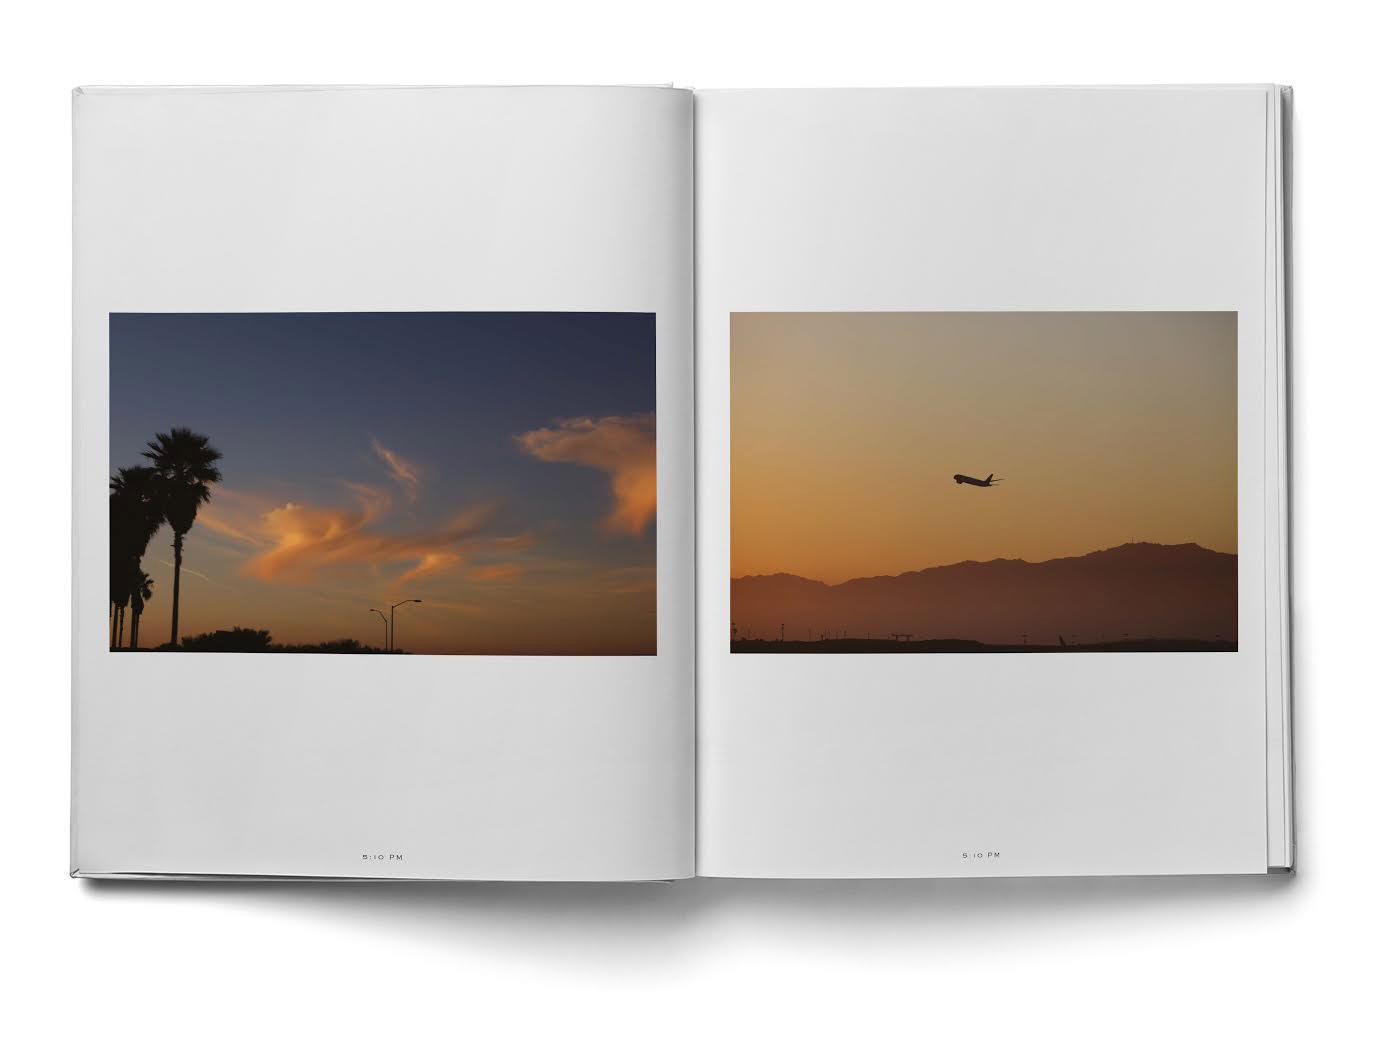 karlhab-24hlosangeles-book-5